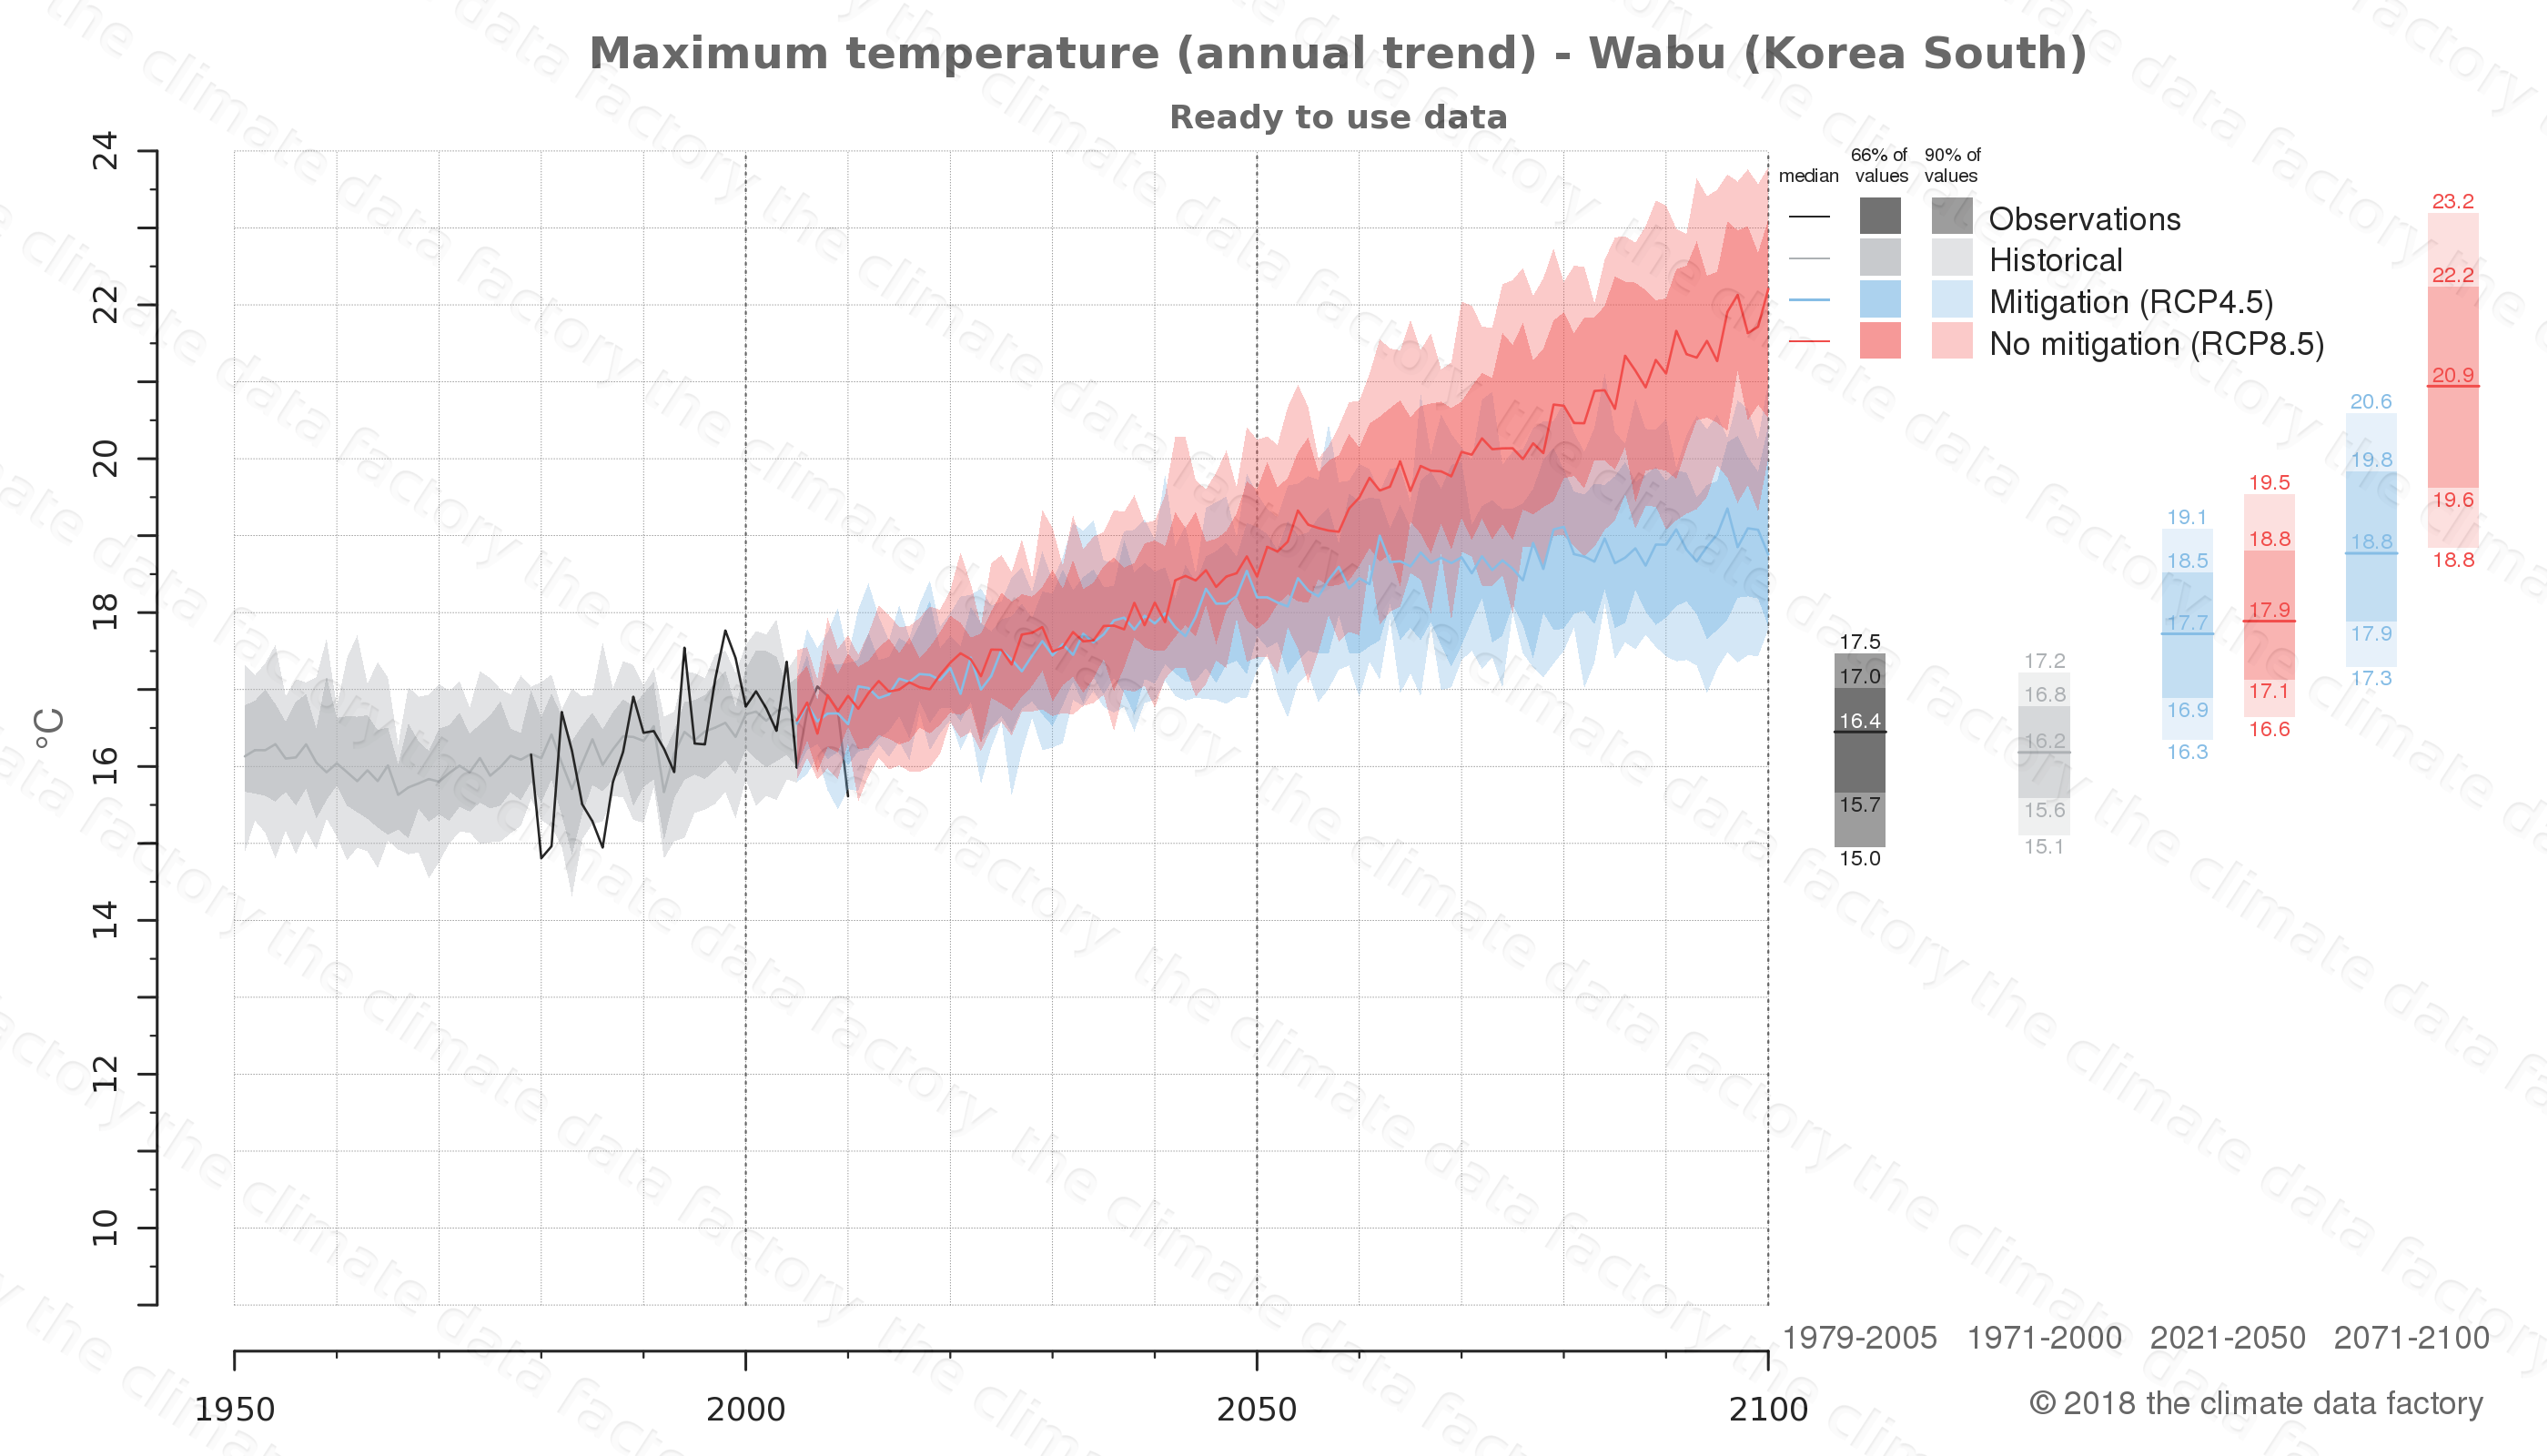 climate change data policy adaptation climate graph city data maximum-temperature wabu south korea